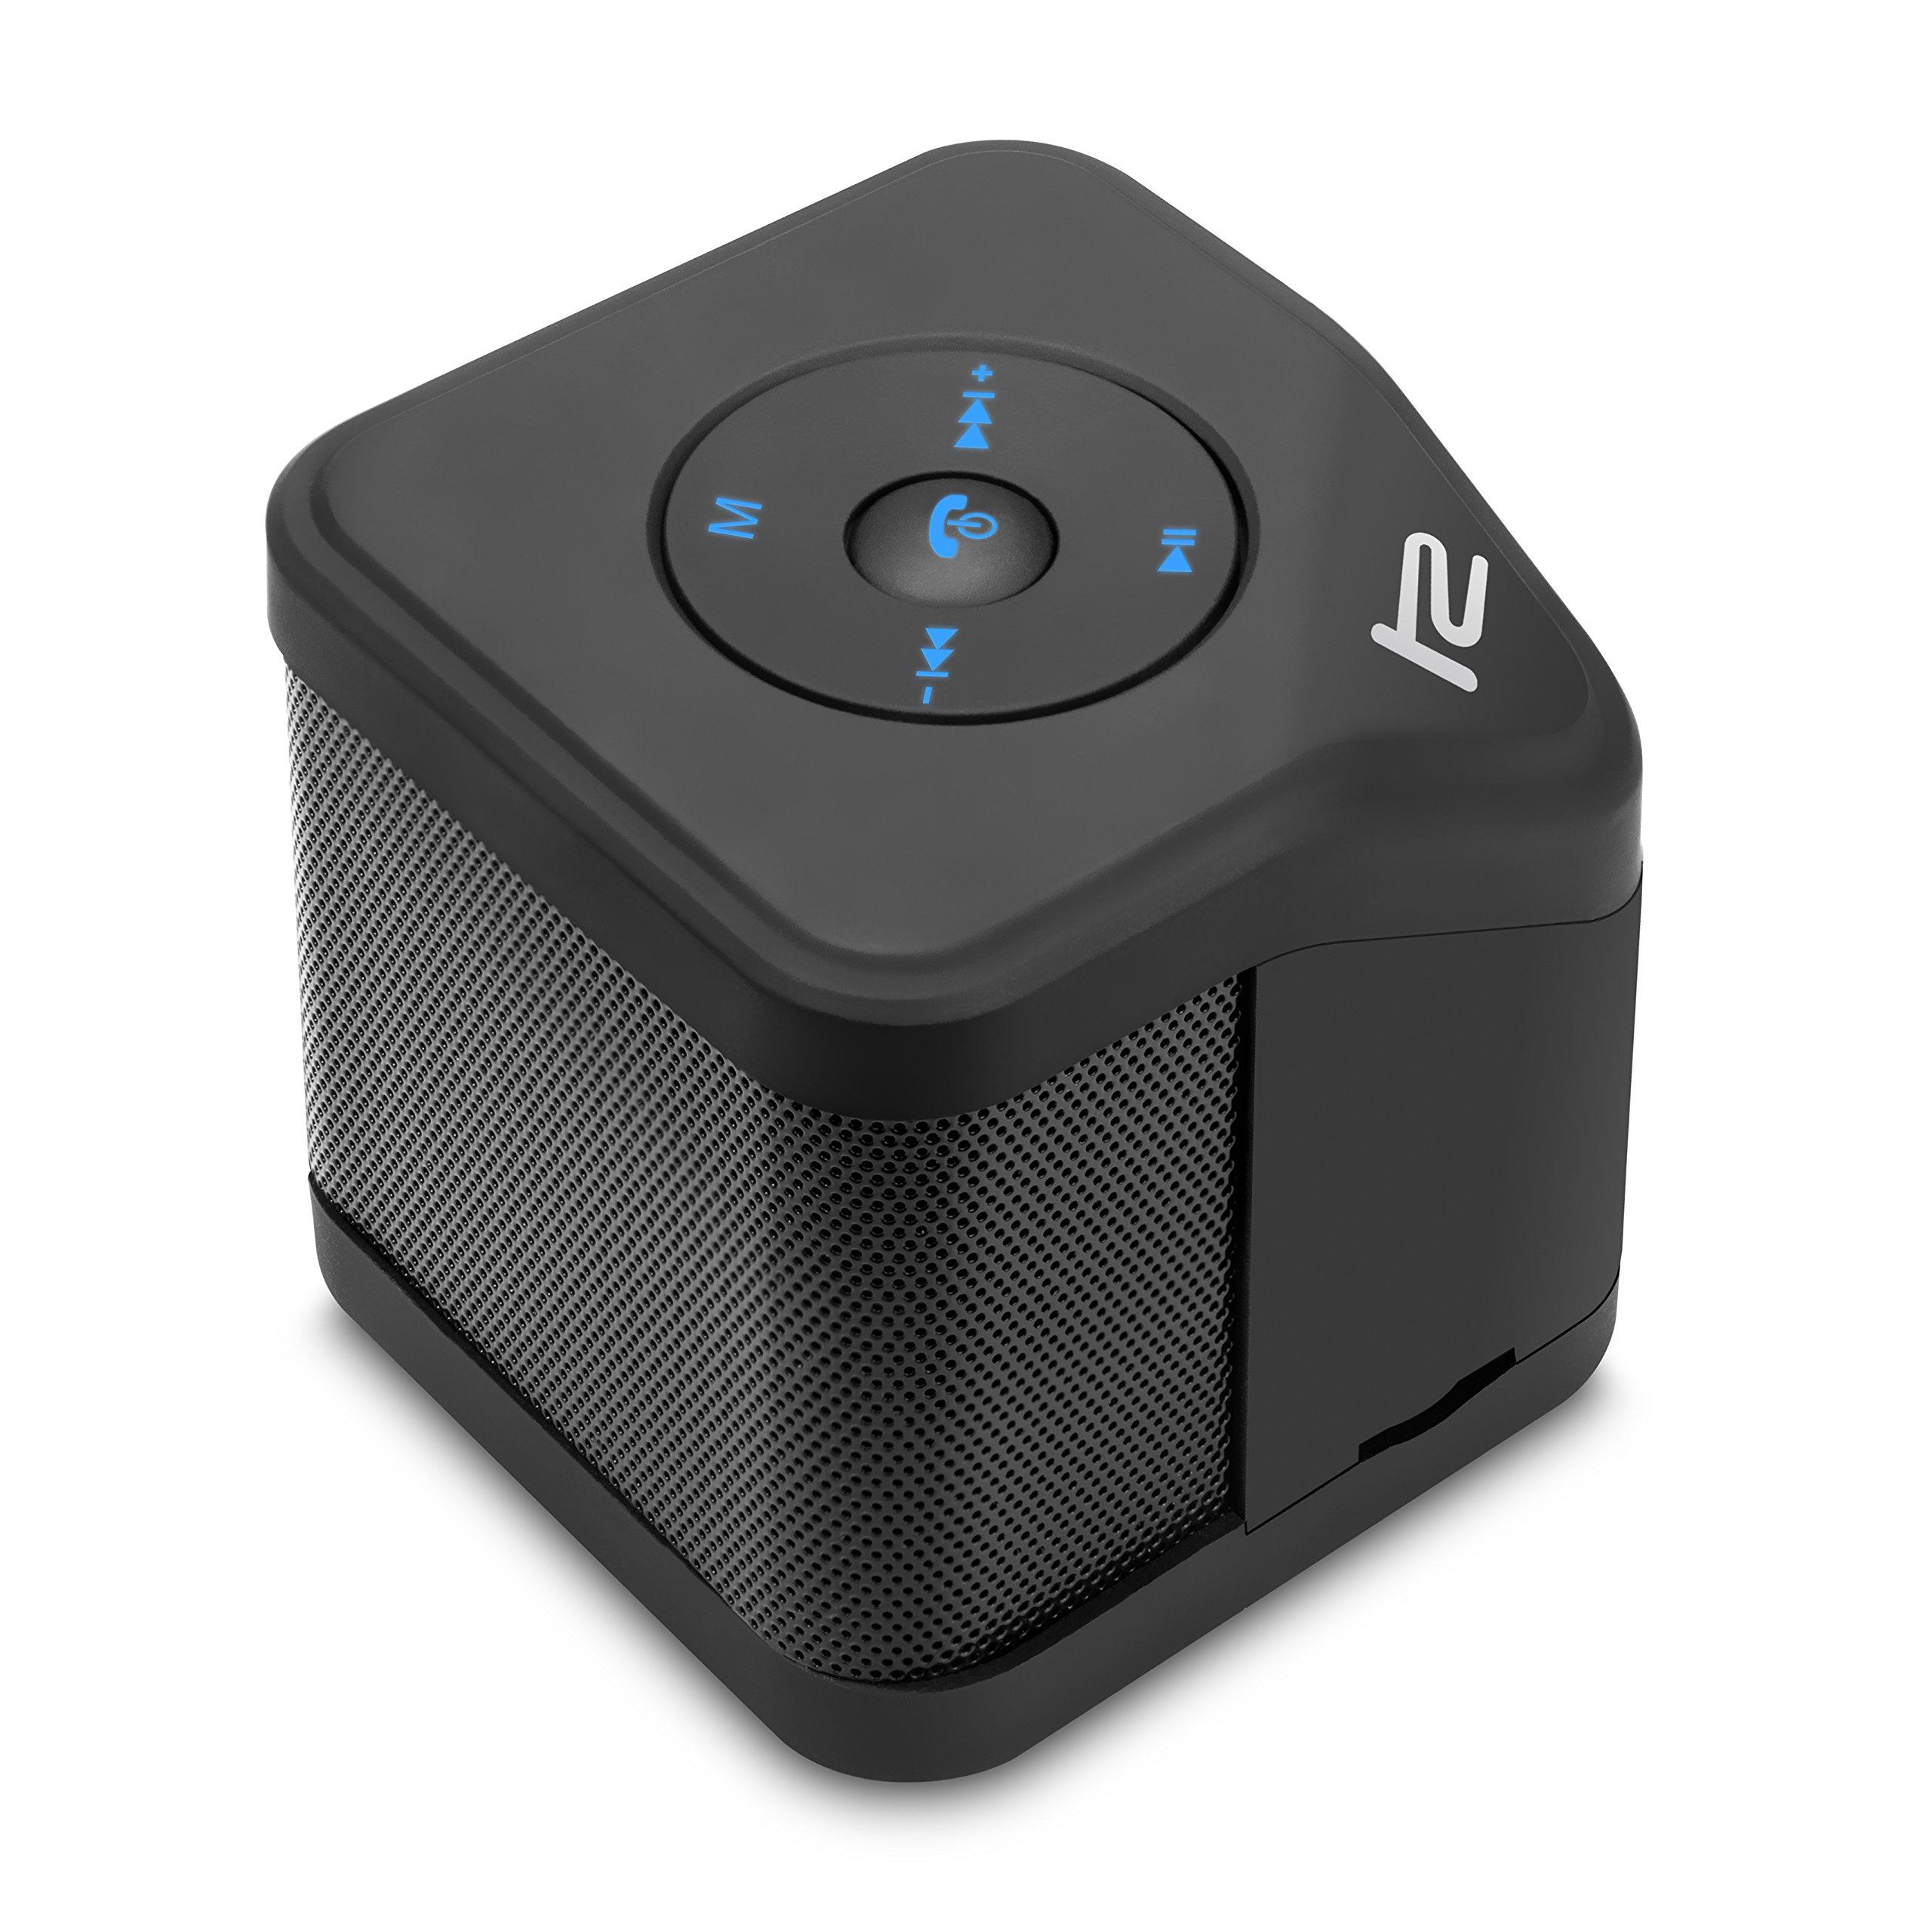 Klip Xtreme BluNote 2 Stereo Speaker- Portable Bluetooth Wireless & Mic- 6 Watt Peak Power, 3W RMS, 40mm Speaker Driver- Mini Pocket Sized- Stream or Connect micro-SD Card- Black Color